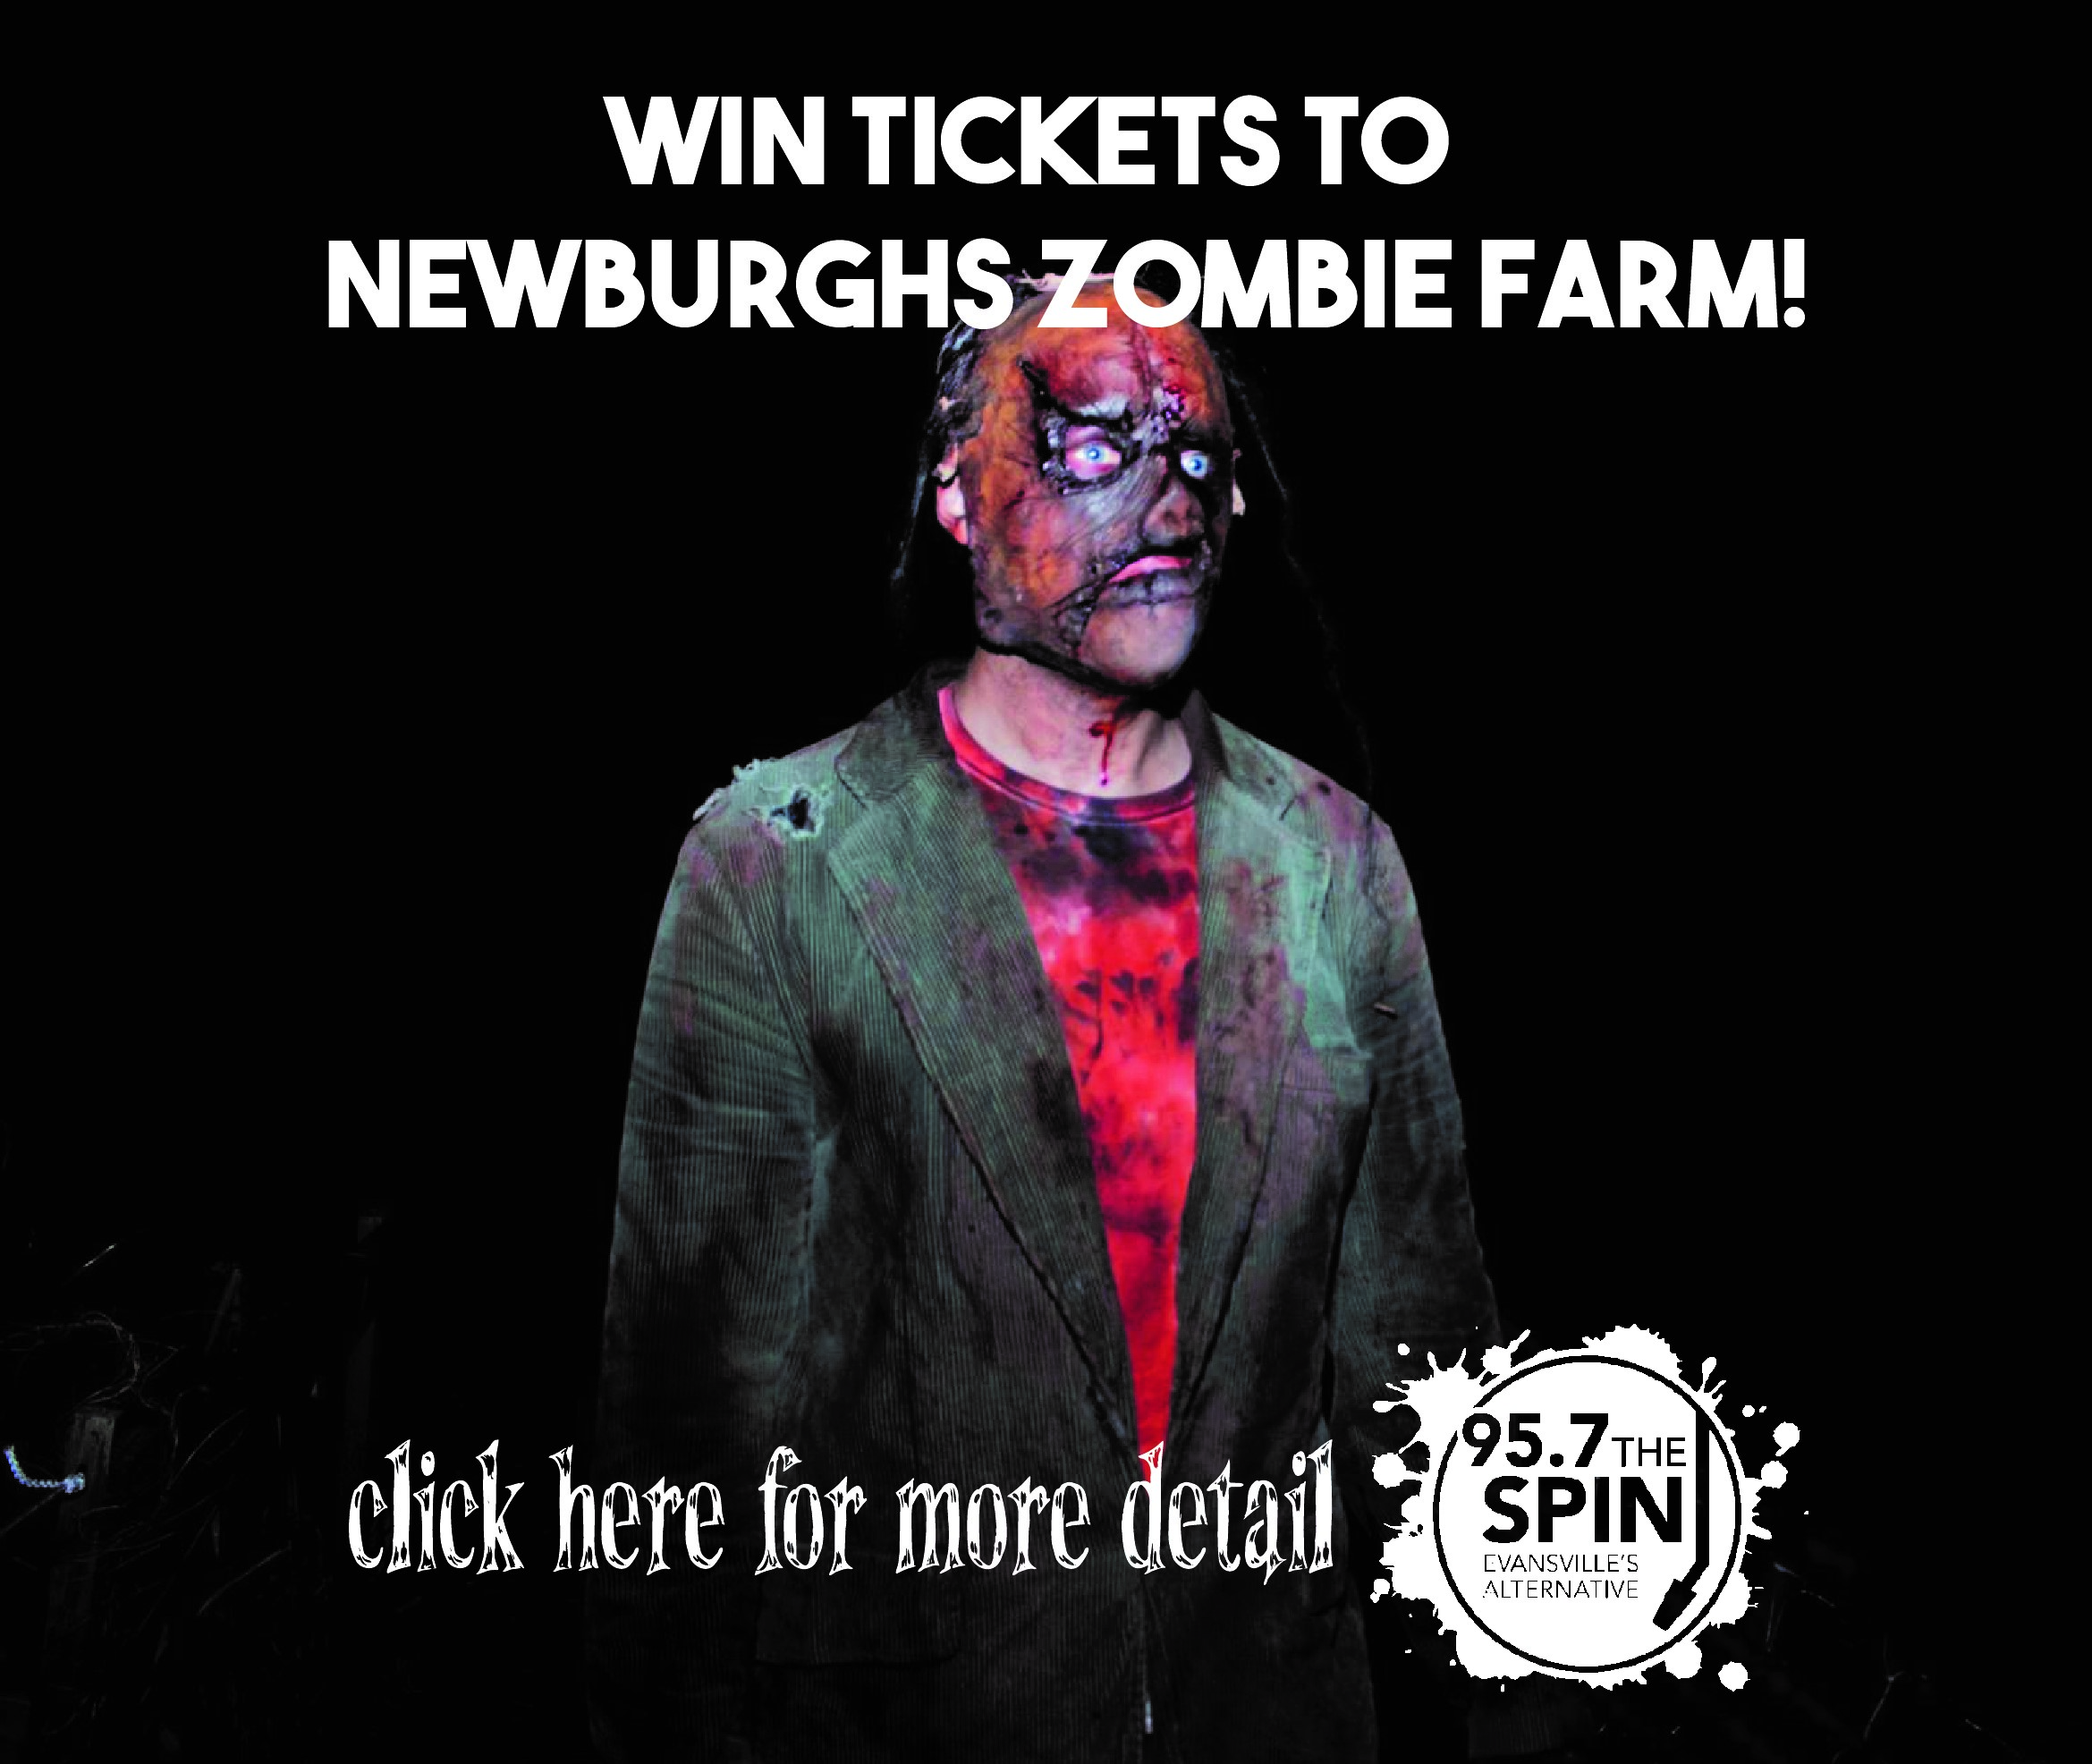 zombie farm web graphic